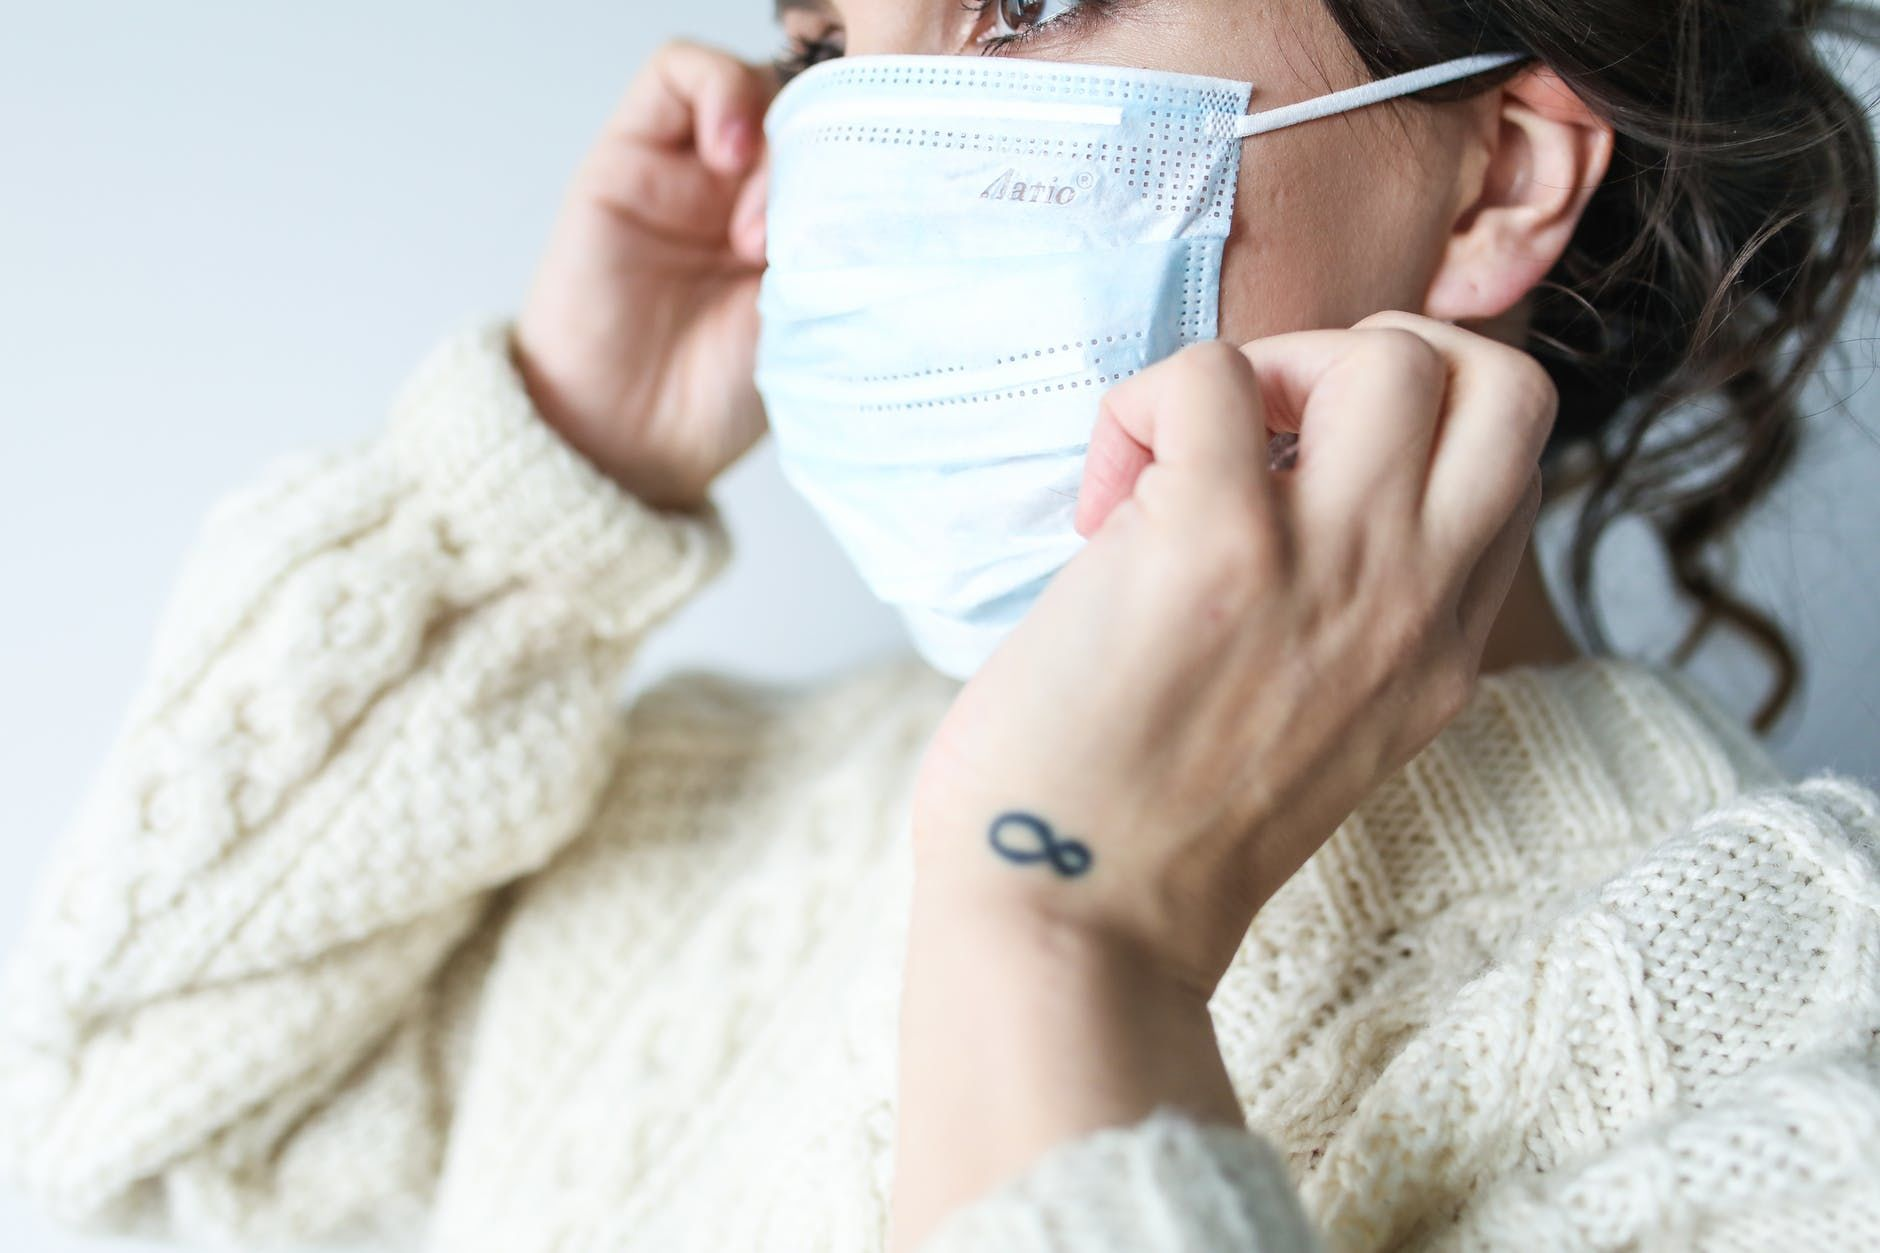 дівчина у масці, коронавірус